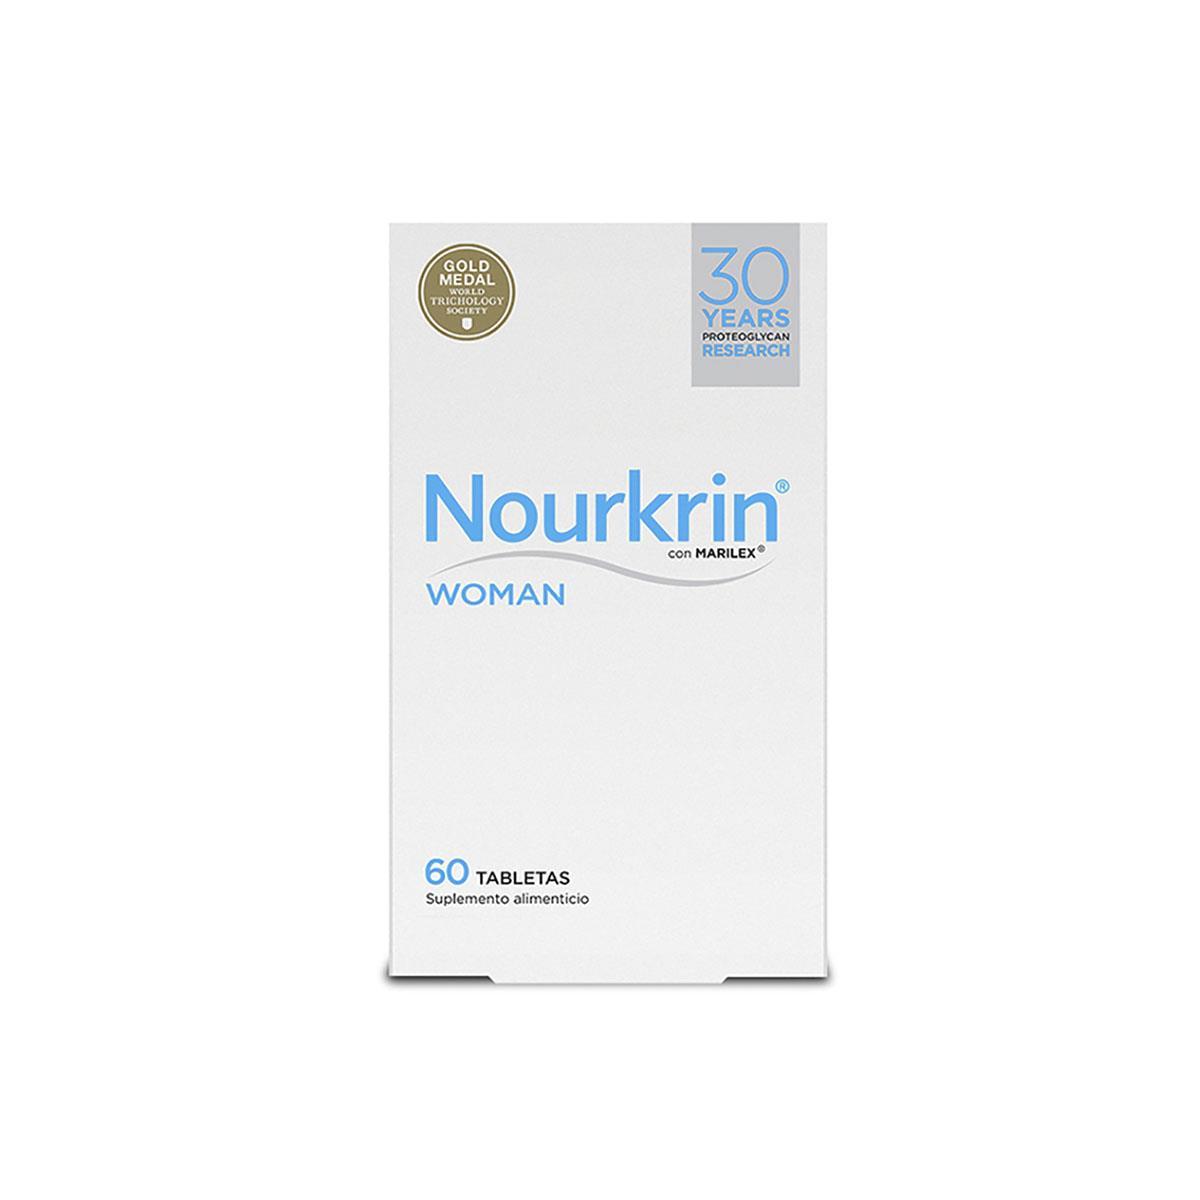 Nourkrin Woman Caja /60 Tabletas